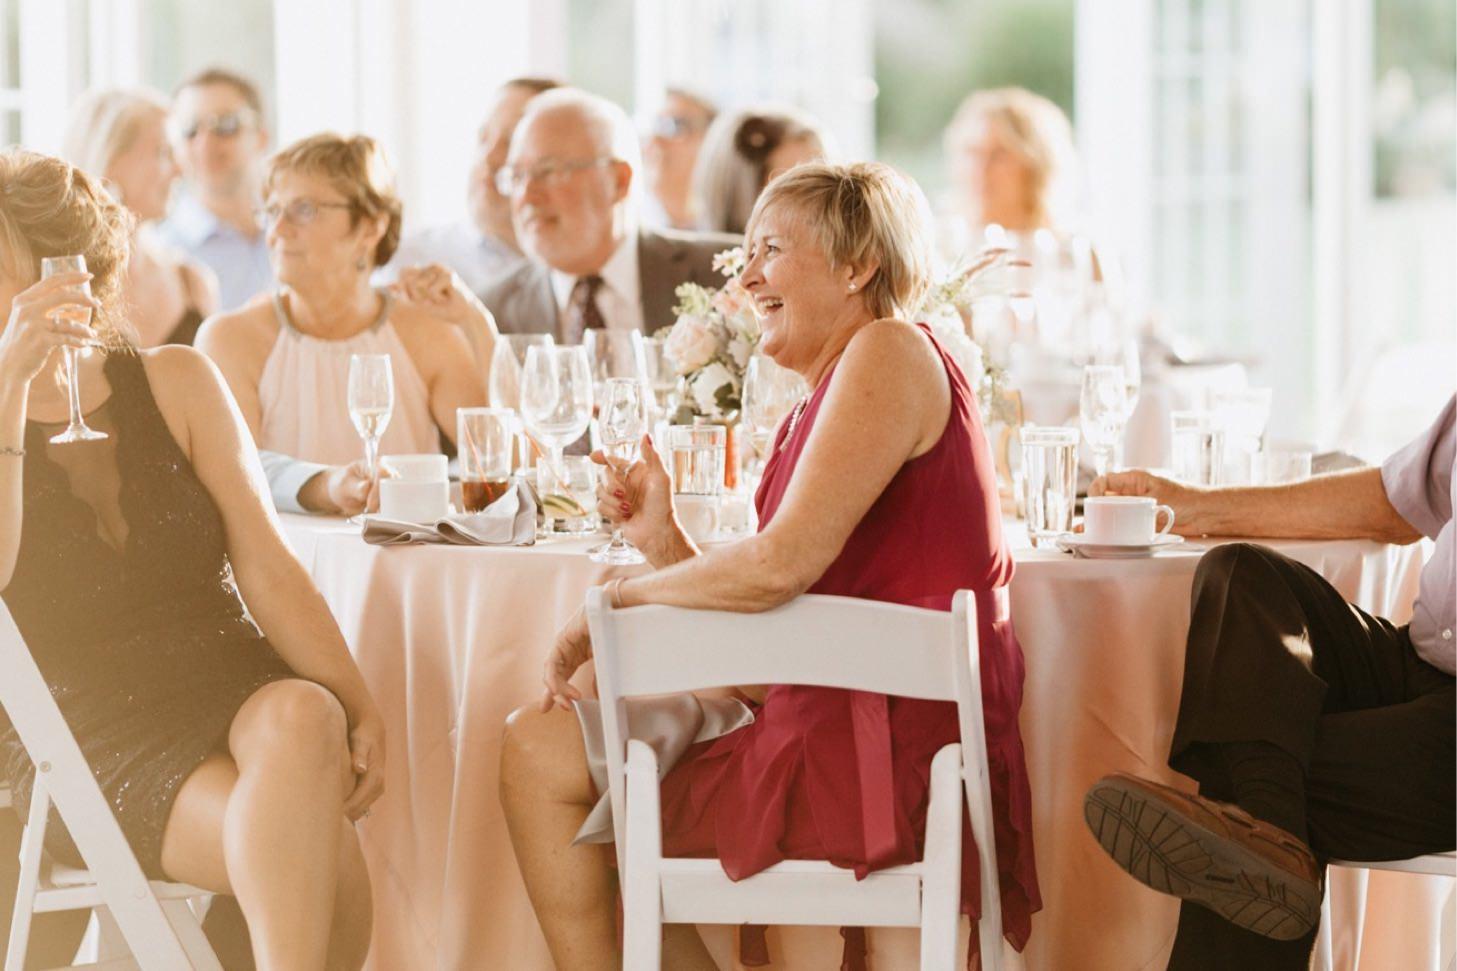 ritz-charles-wedding-reception-downtown-indianapolis-wedding-photographer036.JPG